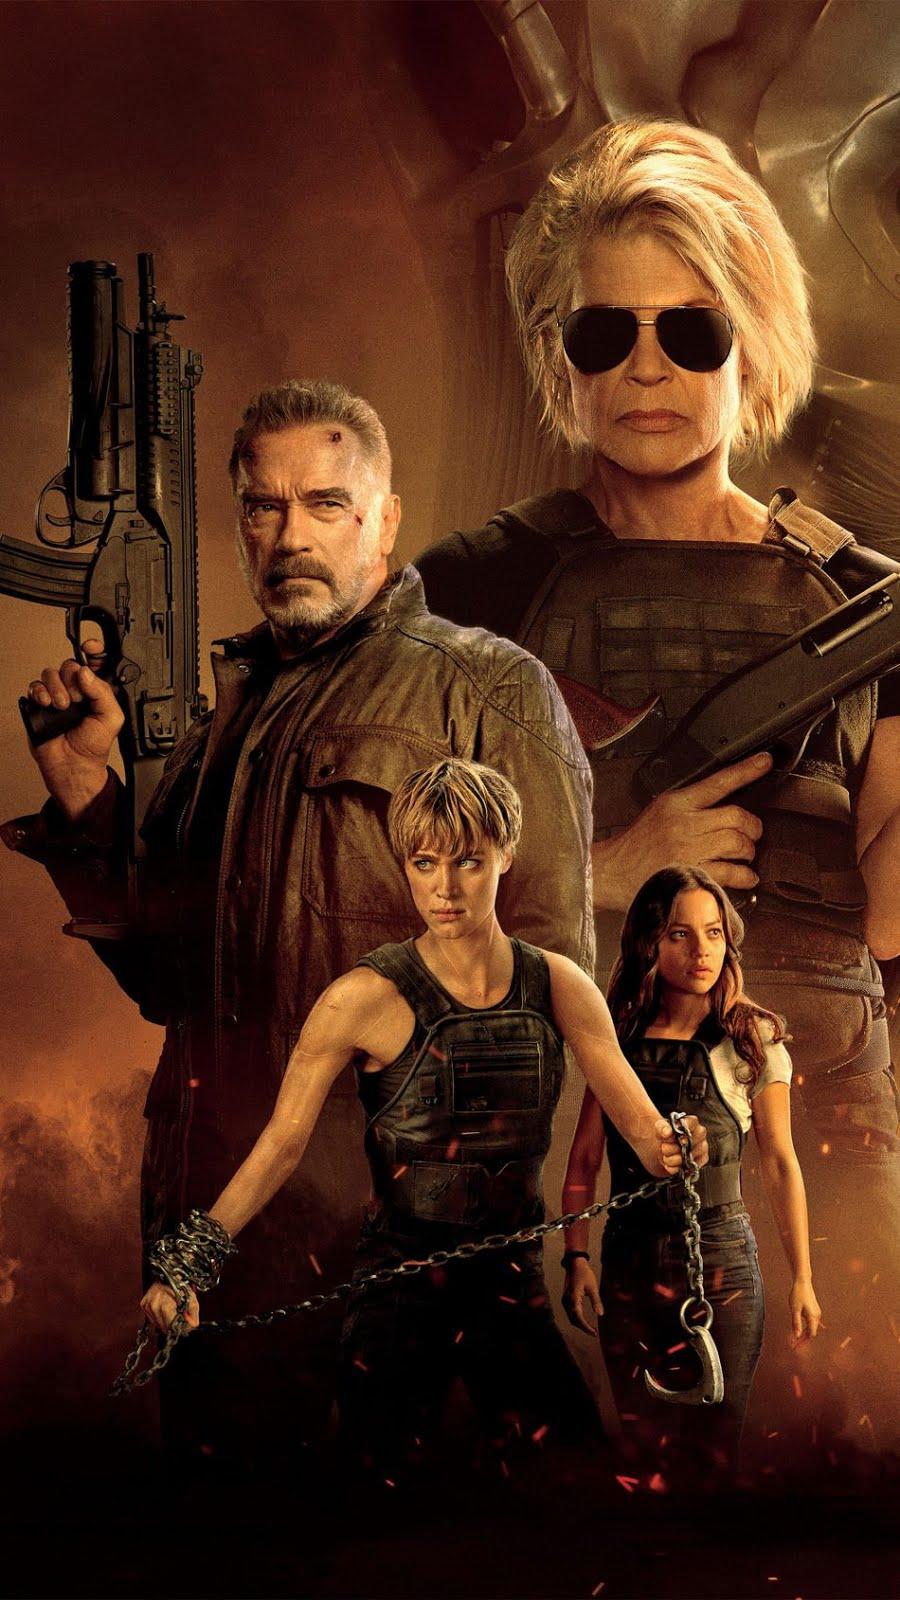 Terminator Dark Fate 2019 (Hindi Subbad) 720p HDCAM 900MB Free Download